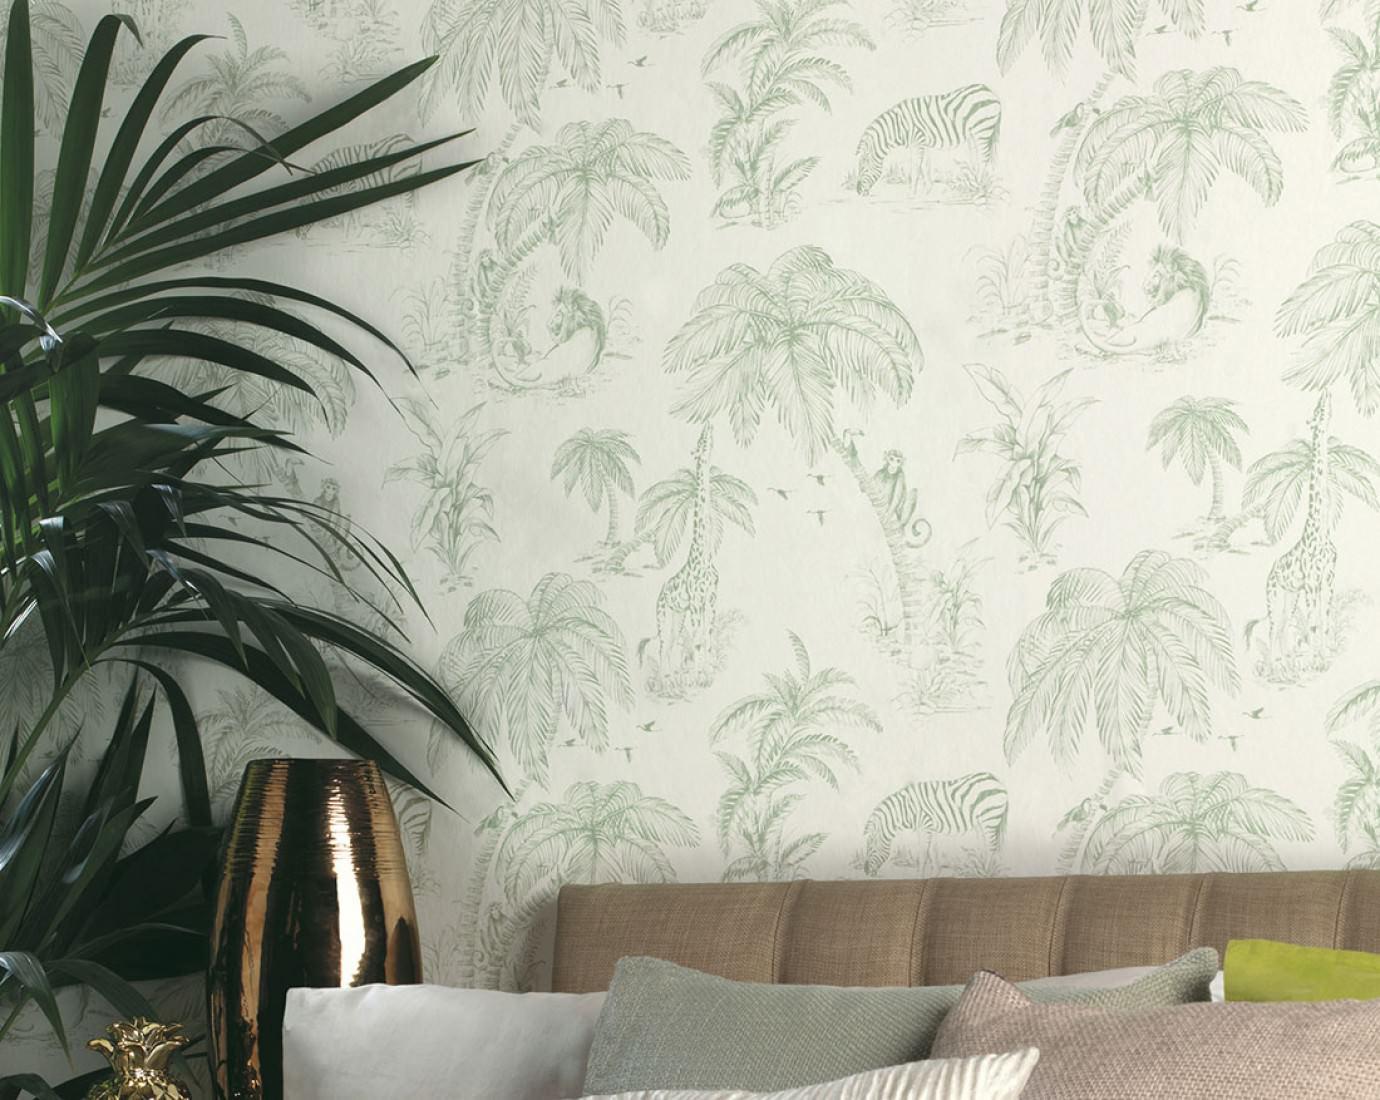 urati cremeweiss farngr n ausgefallene tapeten. Black Bedroom Furniture Sets. Home Design Ideas